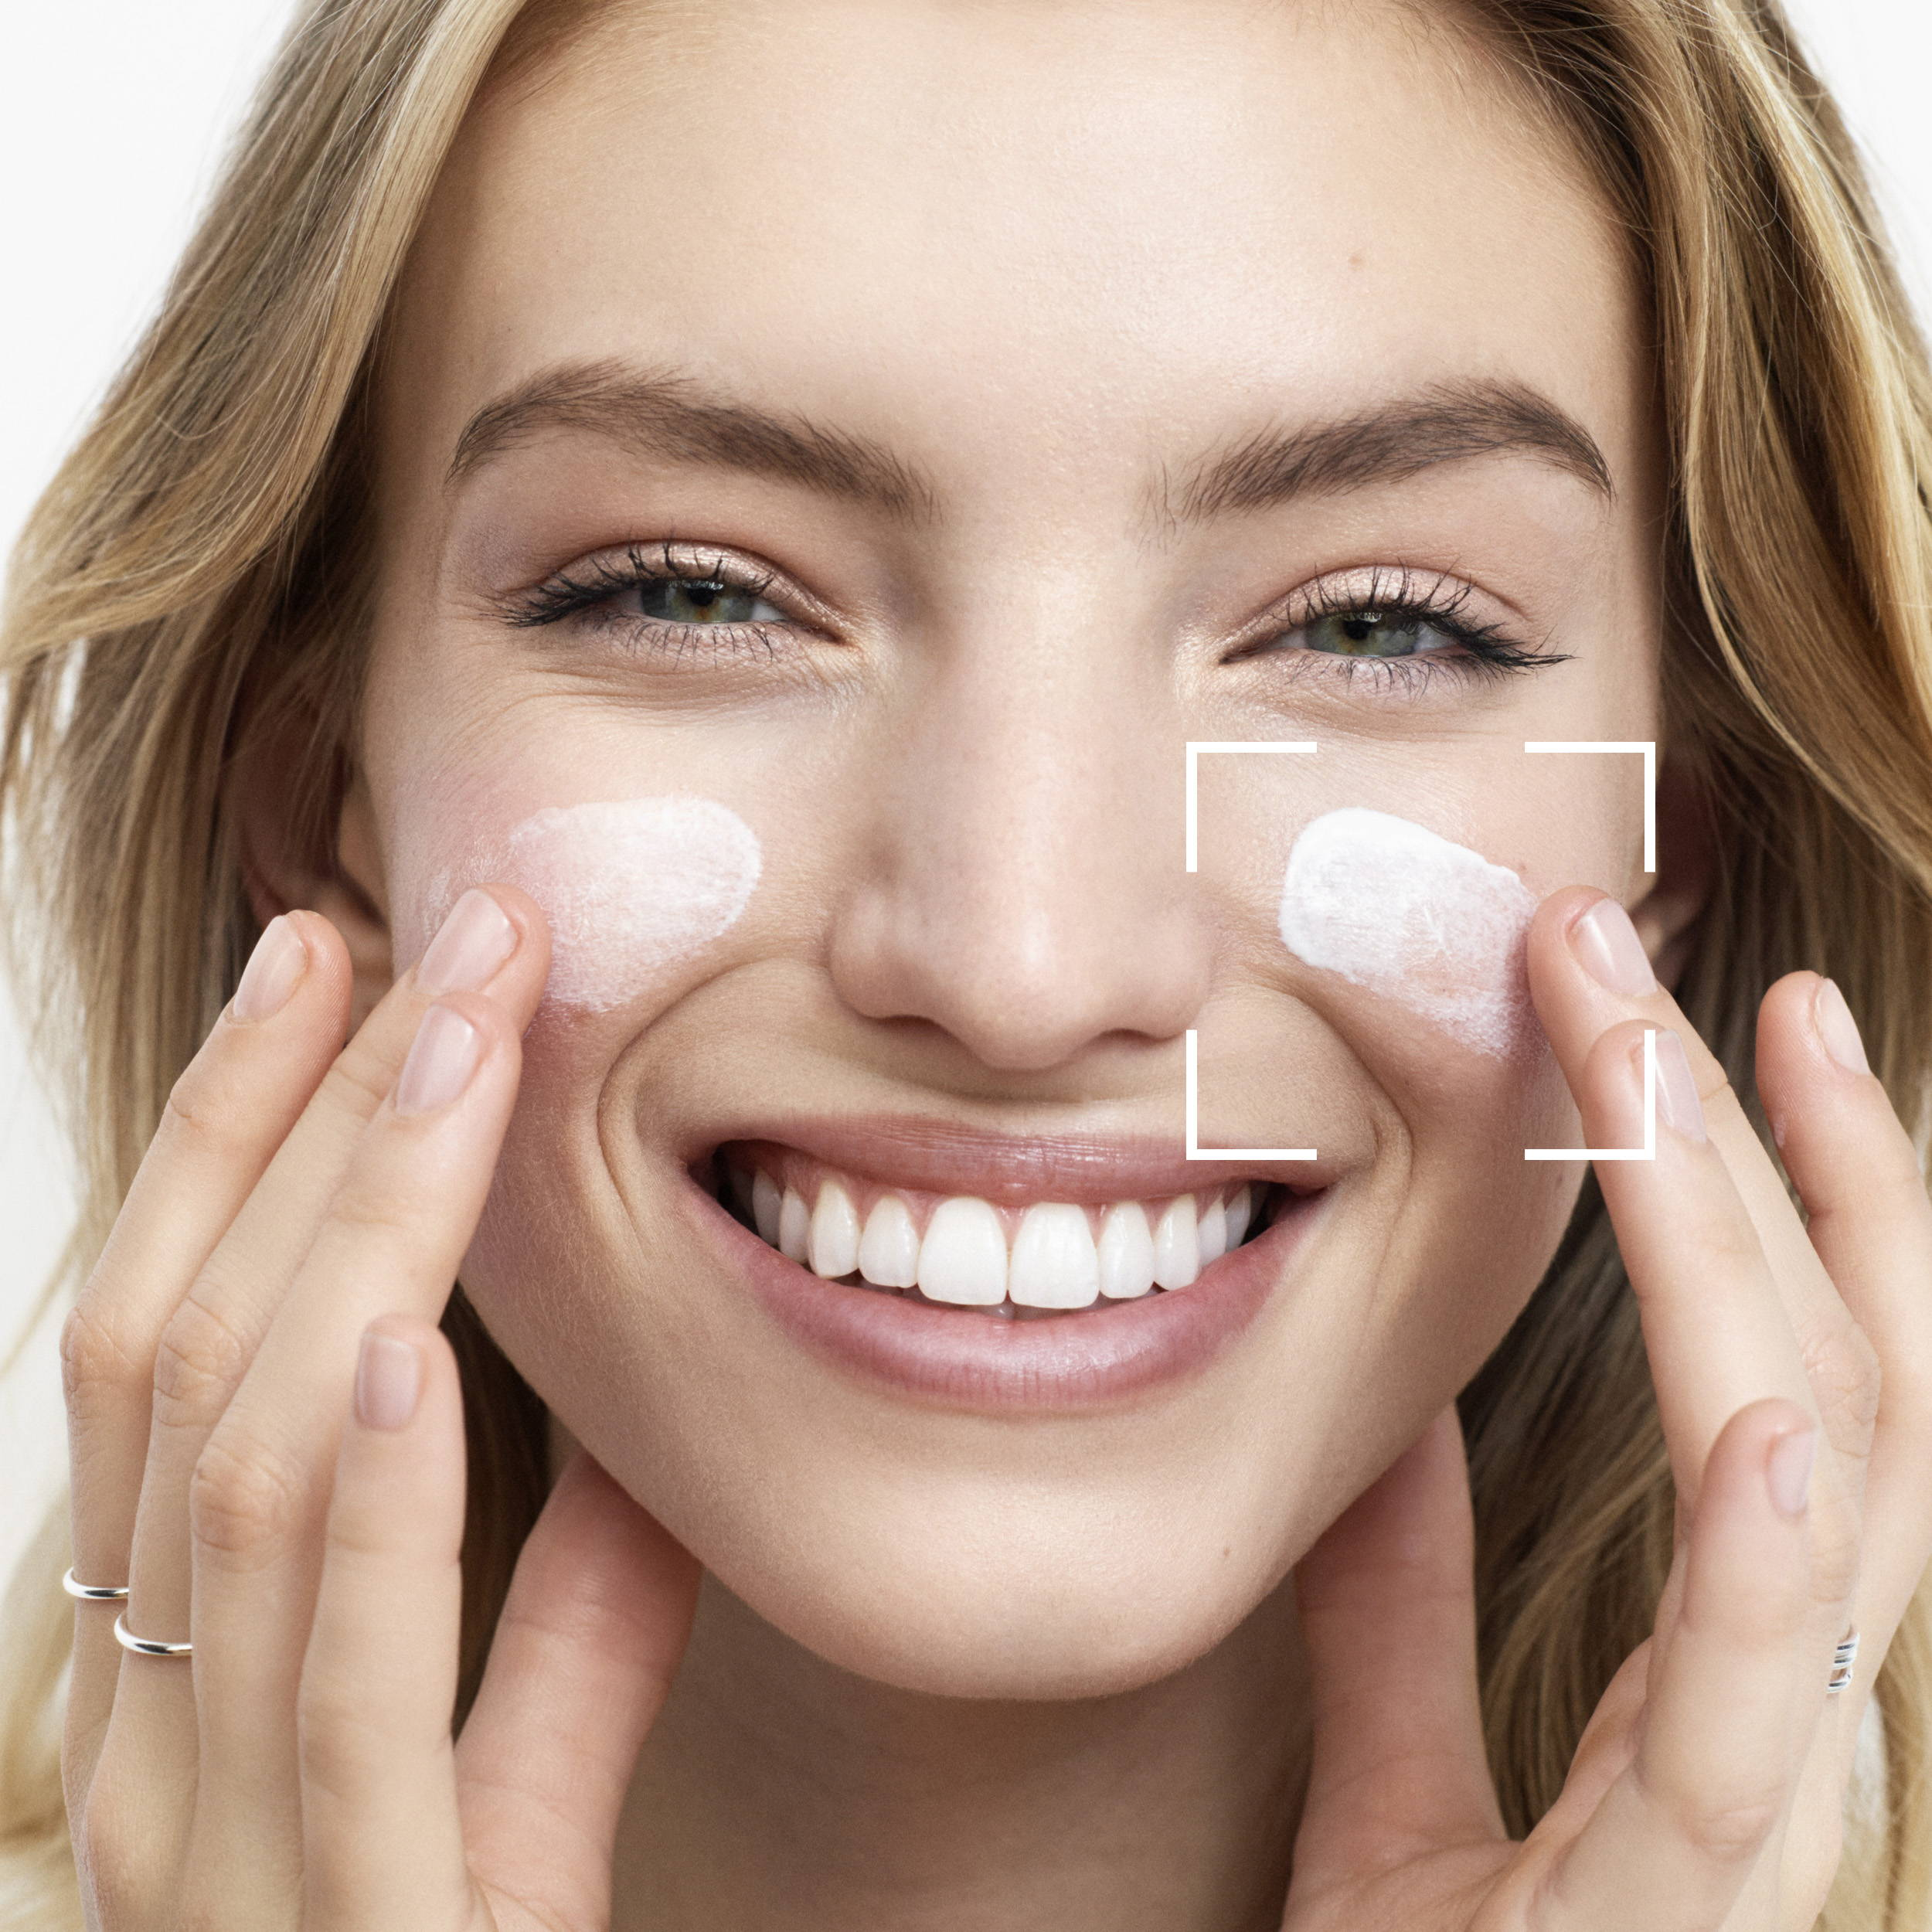 Olay Skin Advisor